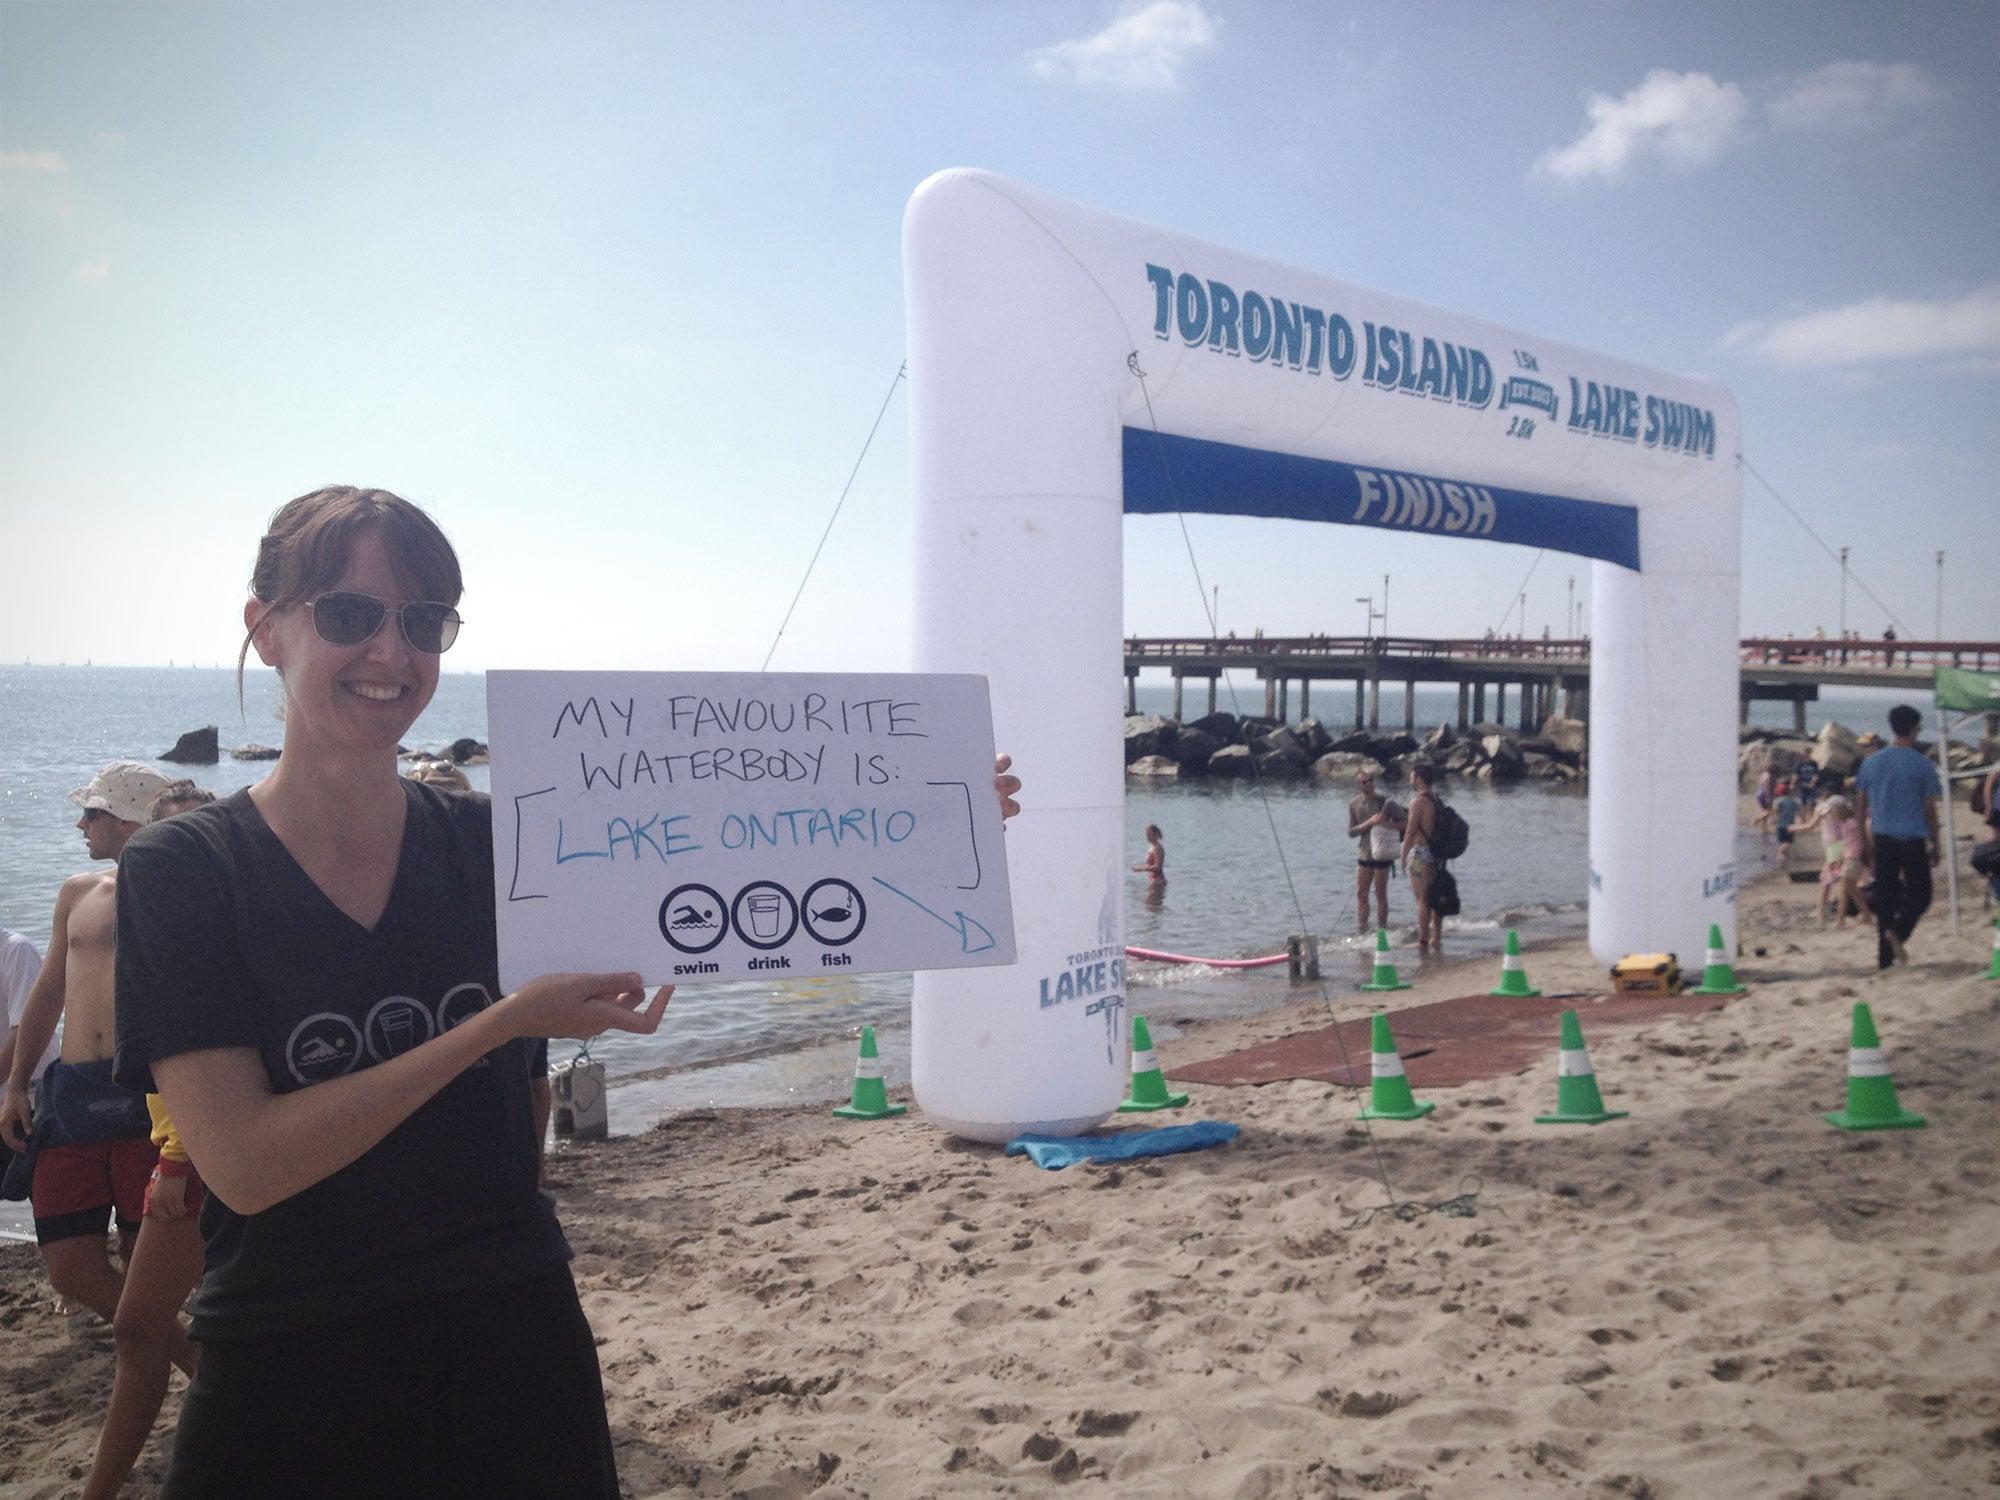 Krystyn showing her love for her favourite waterbody at the 2013 Toronto Island Lake Swim. (Photo via Lake Ontario Waterkeeper)